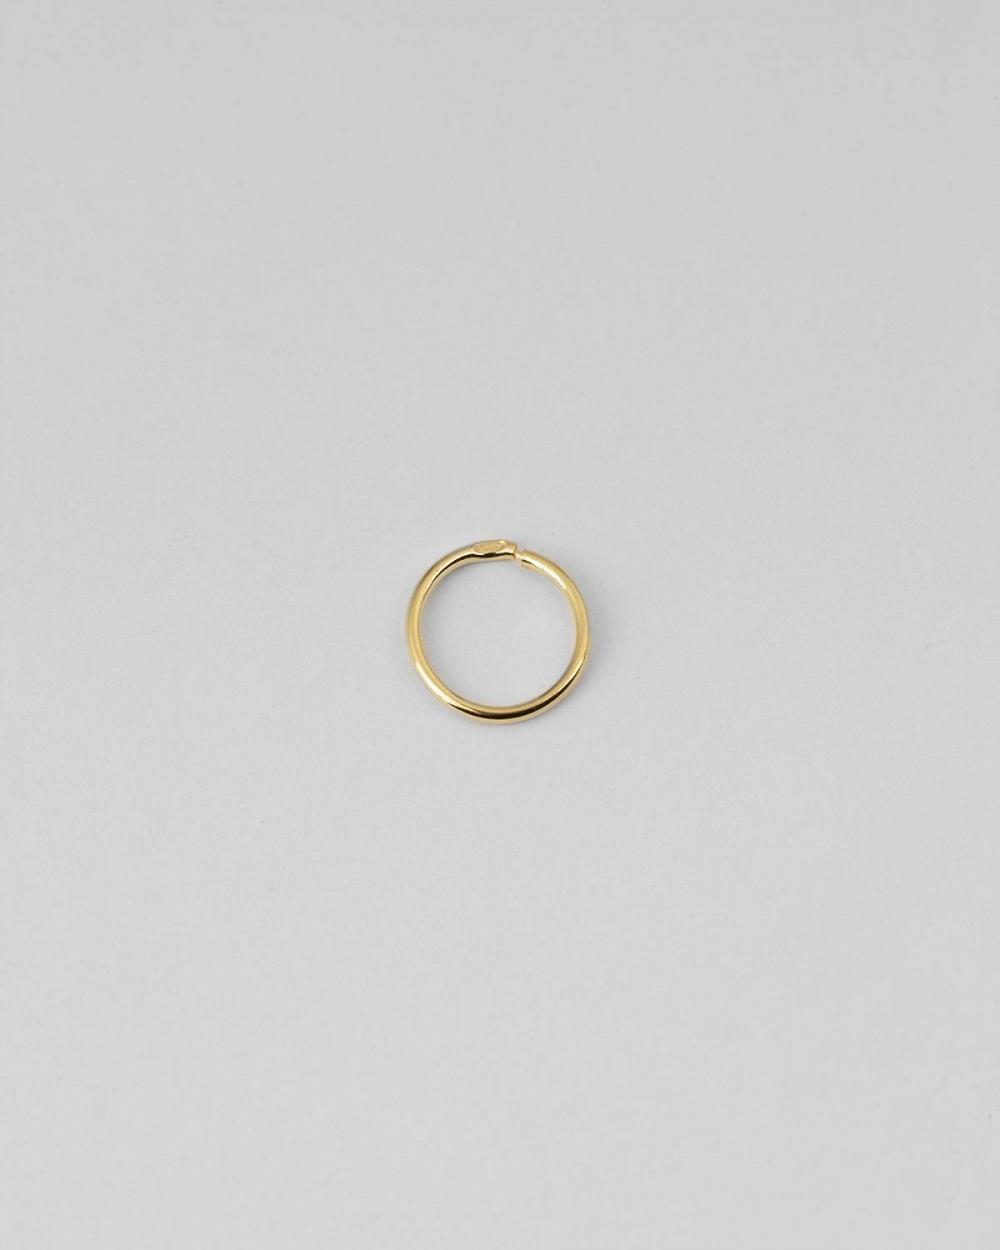 Earrings YELLOW GOLD MINI SINGLE HOOP EARRING 012 D10 NOVE25